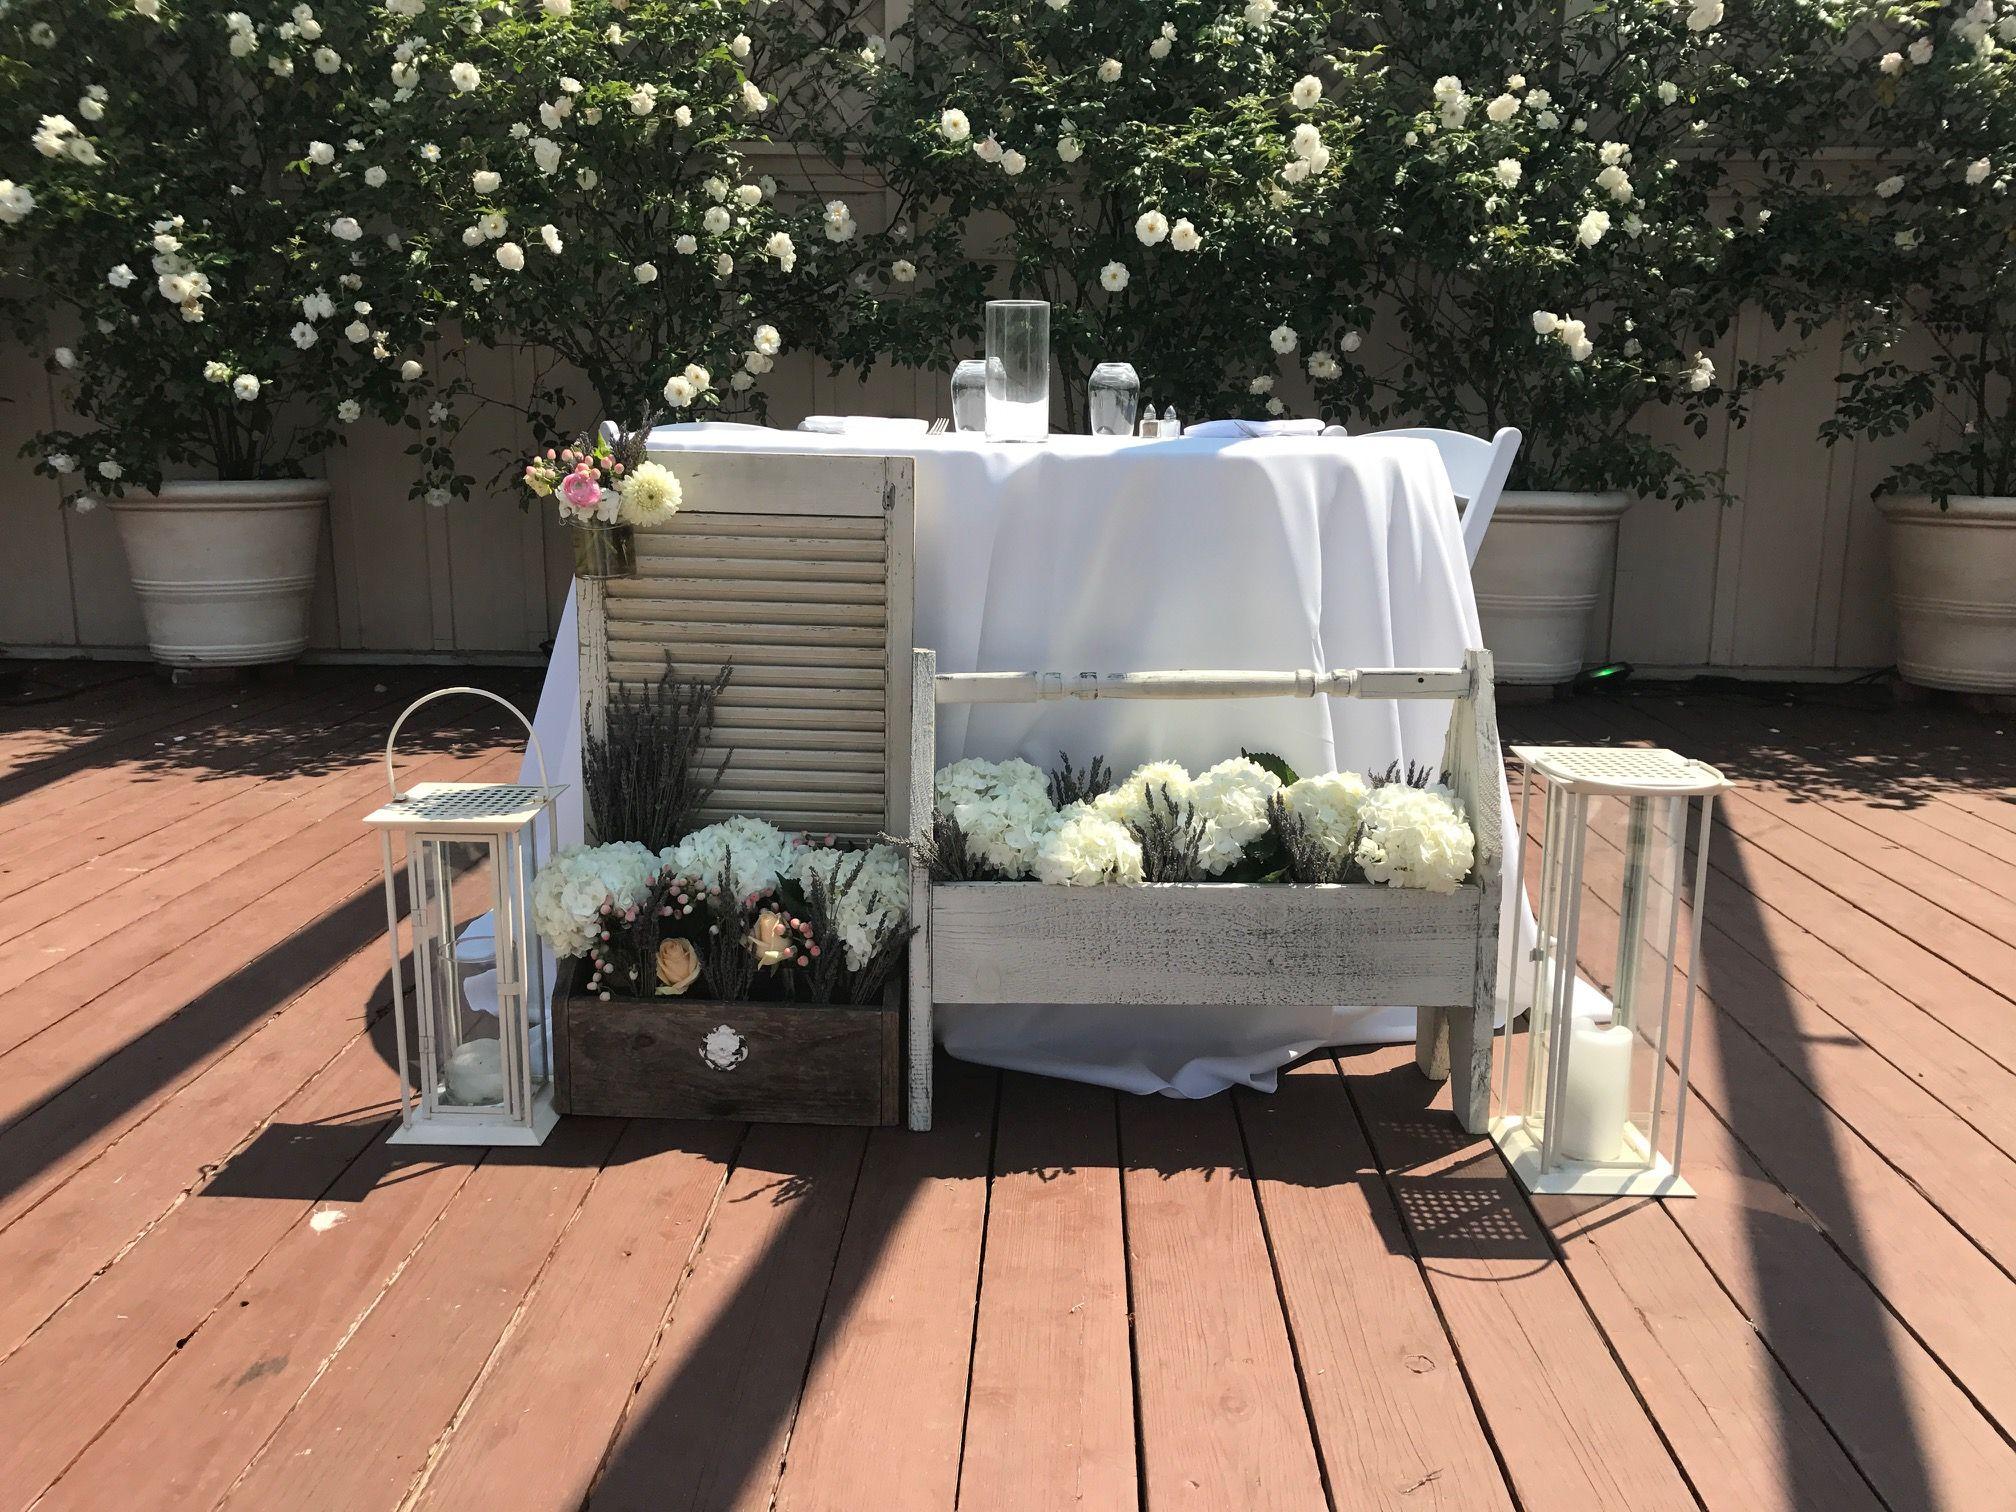 Silverelli Wedding Aesthetic image by Amanda Silver ...